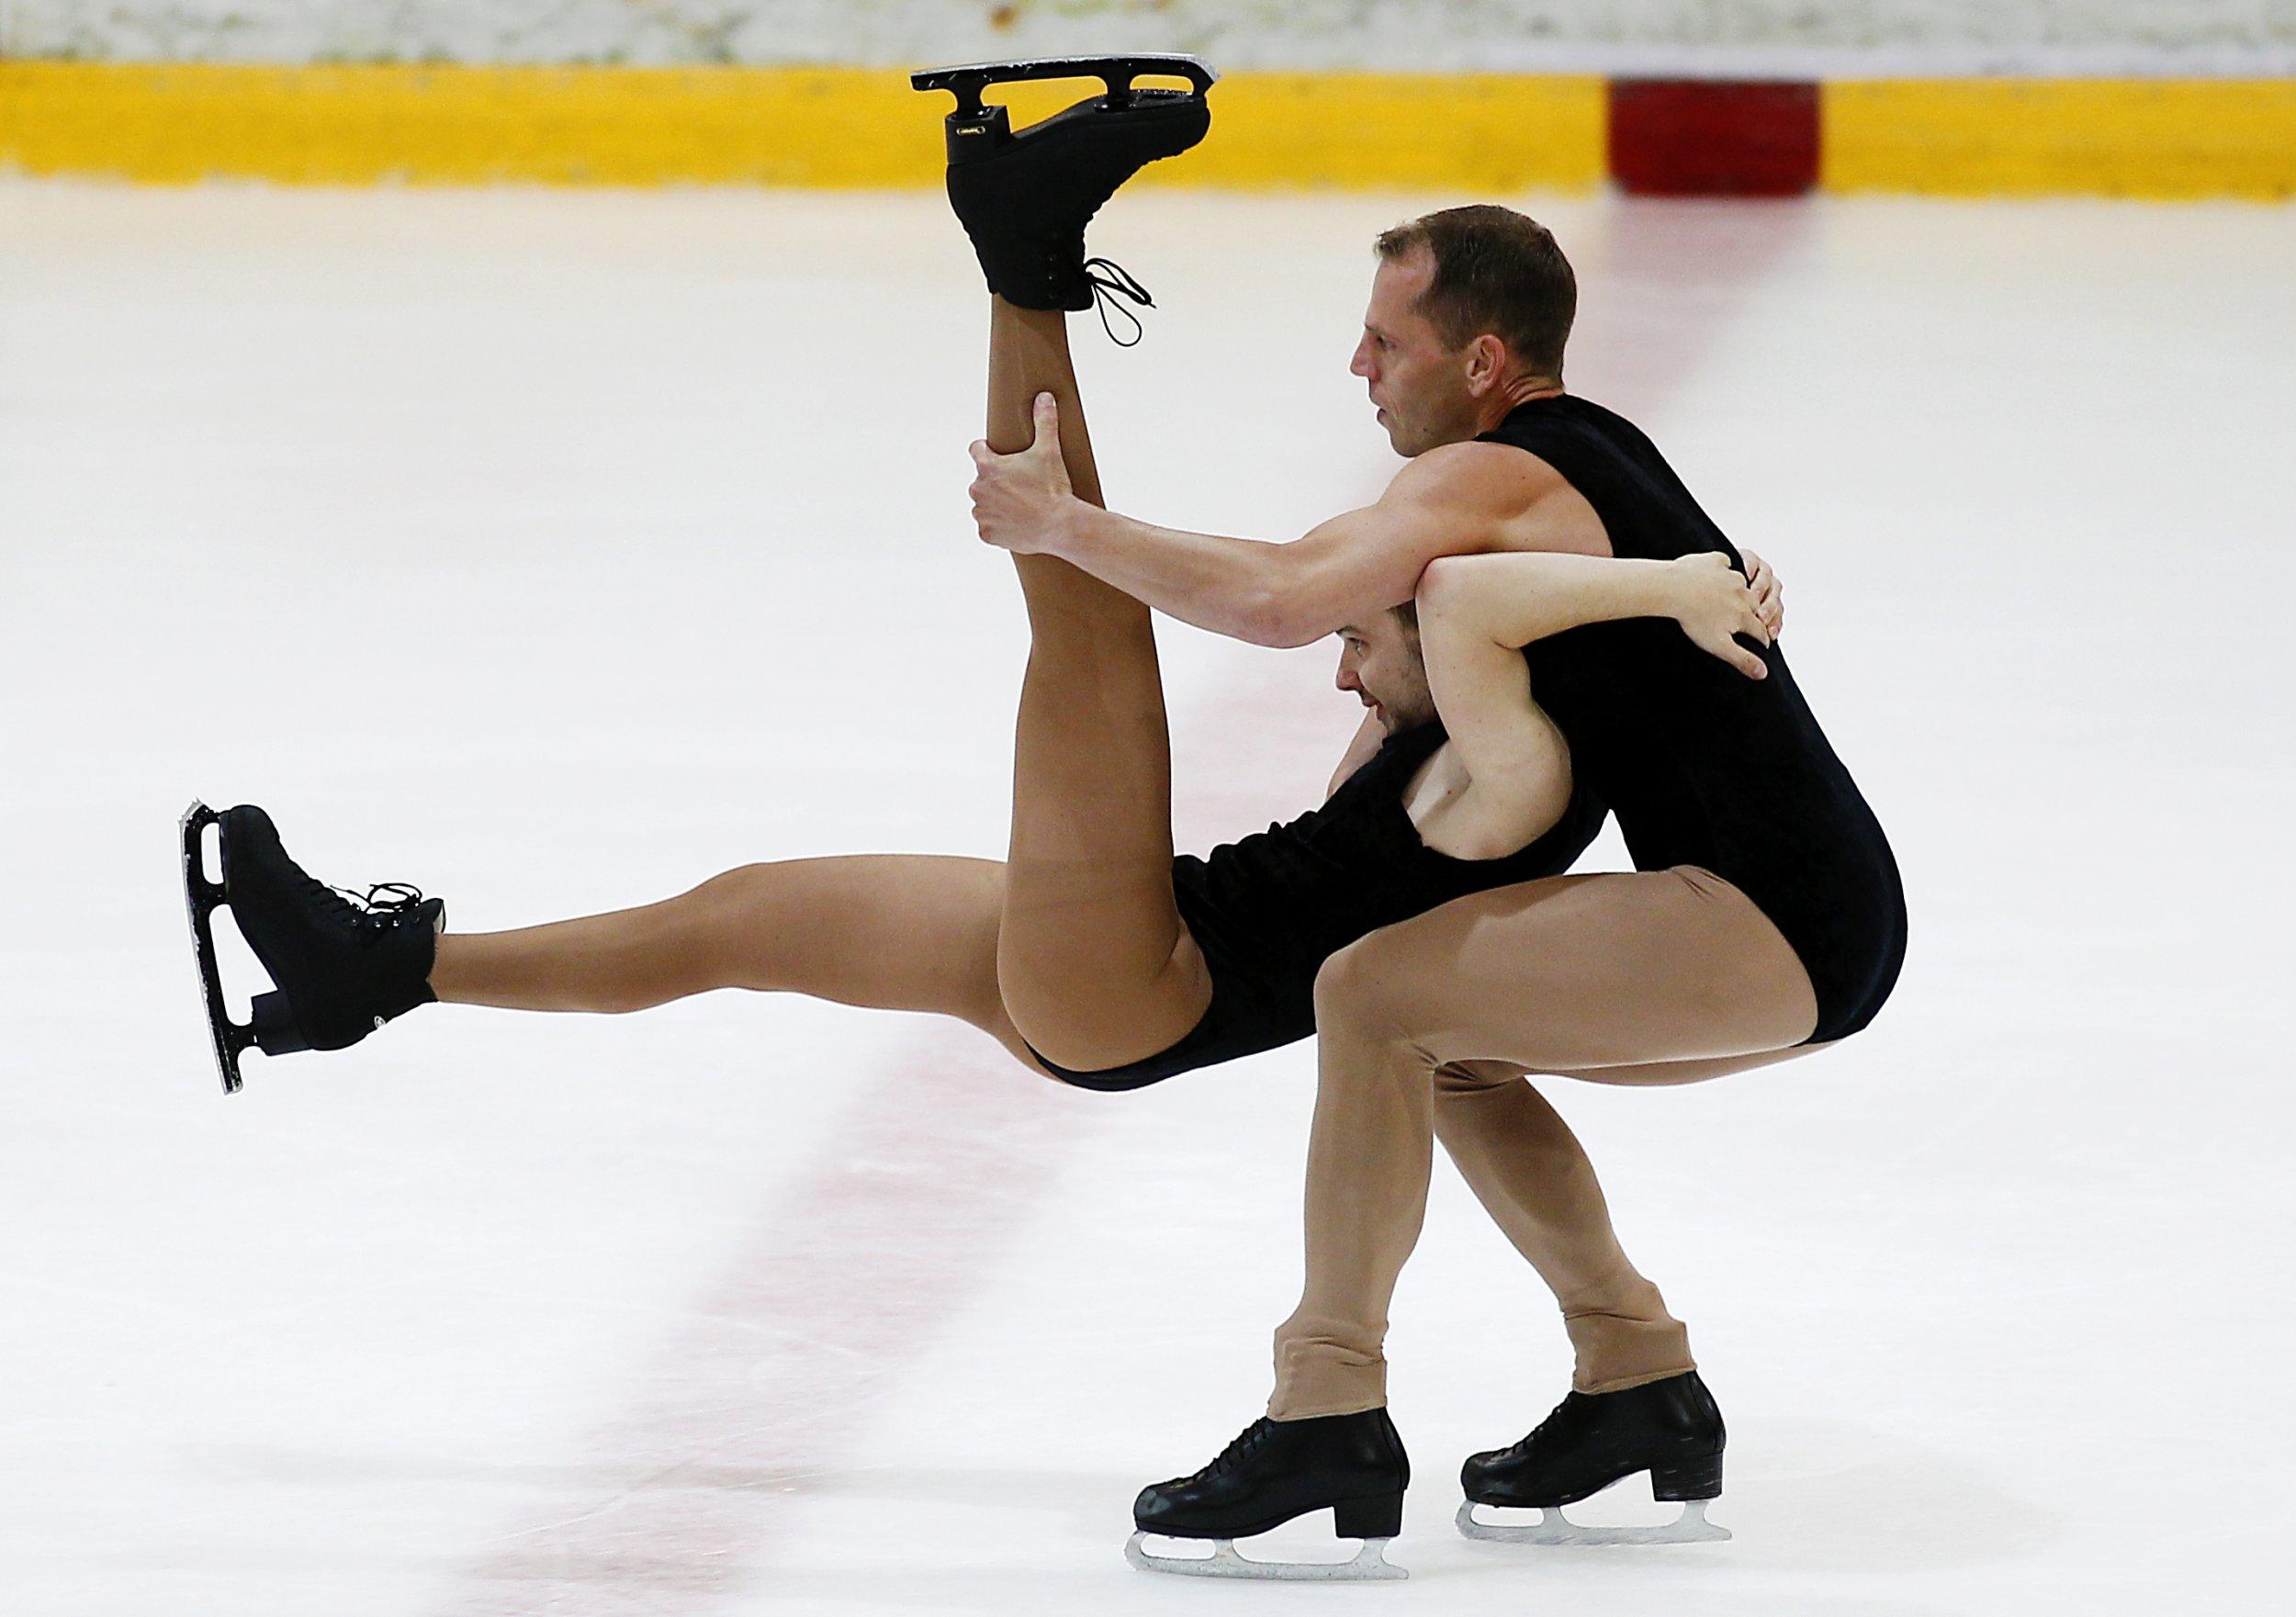 1-31-2014_FE0105_FigureSkating_05